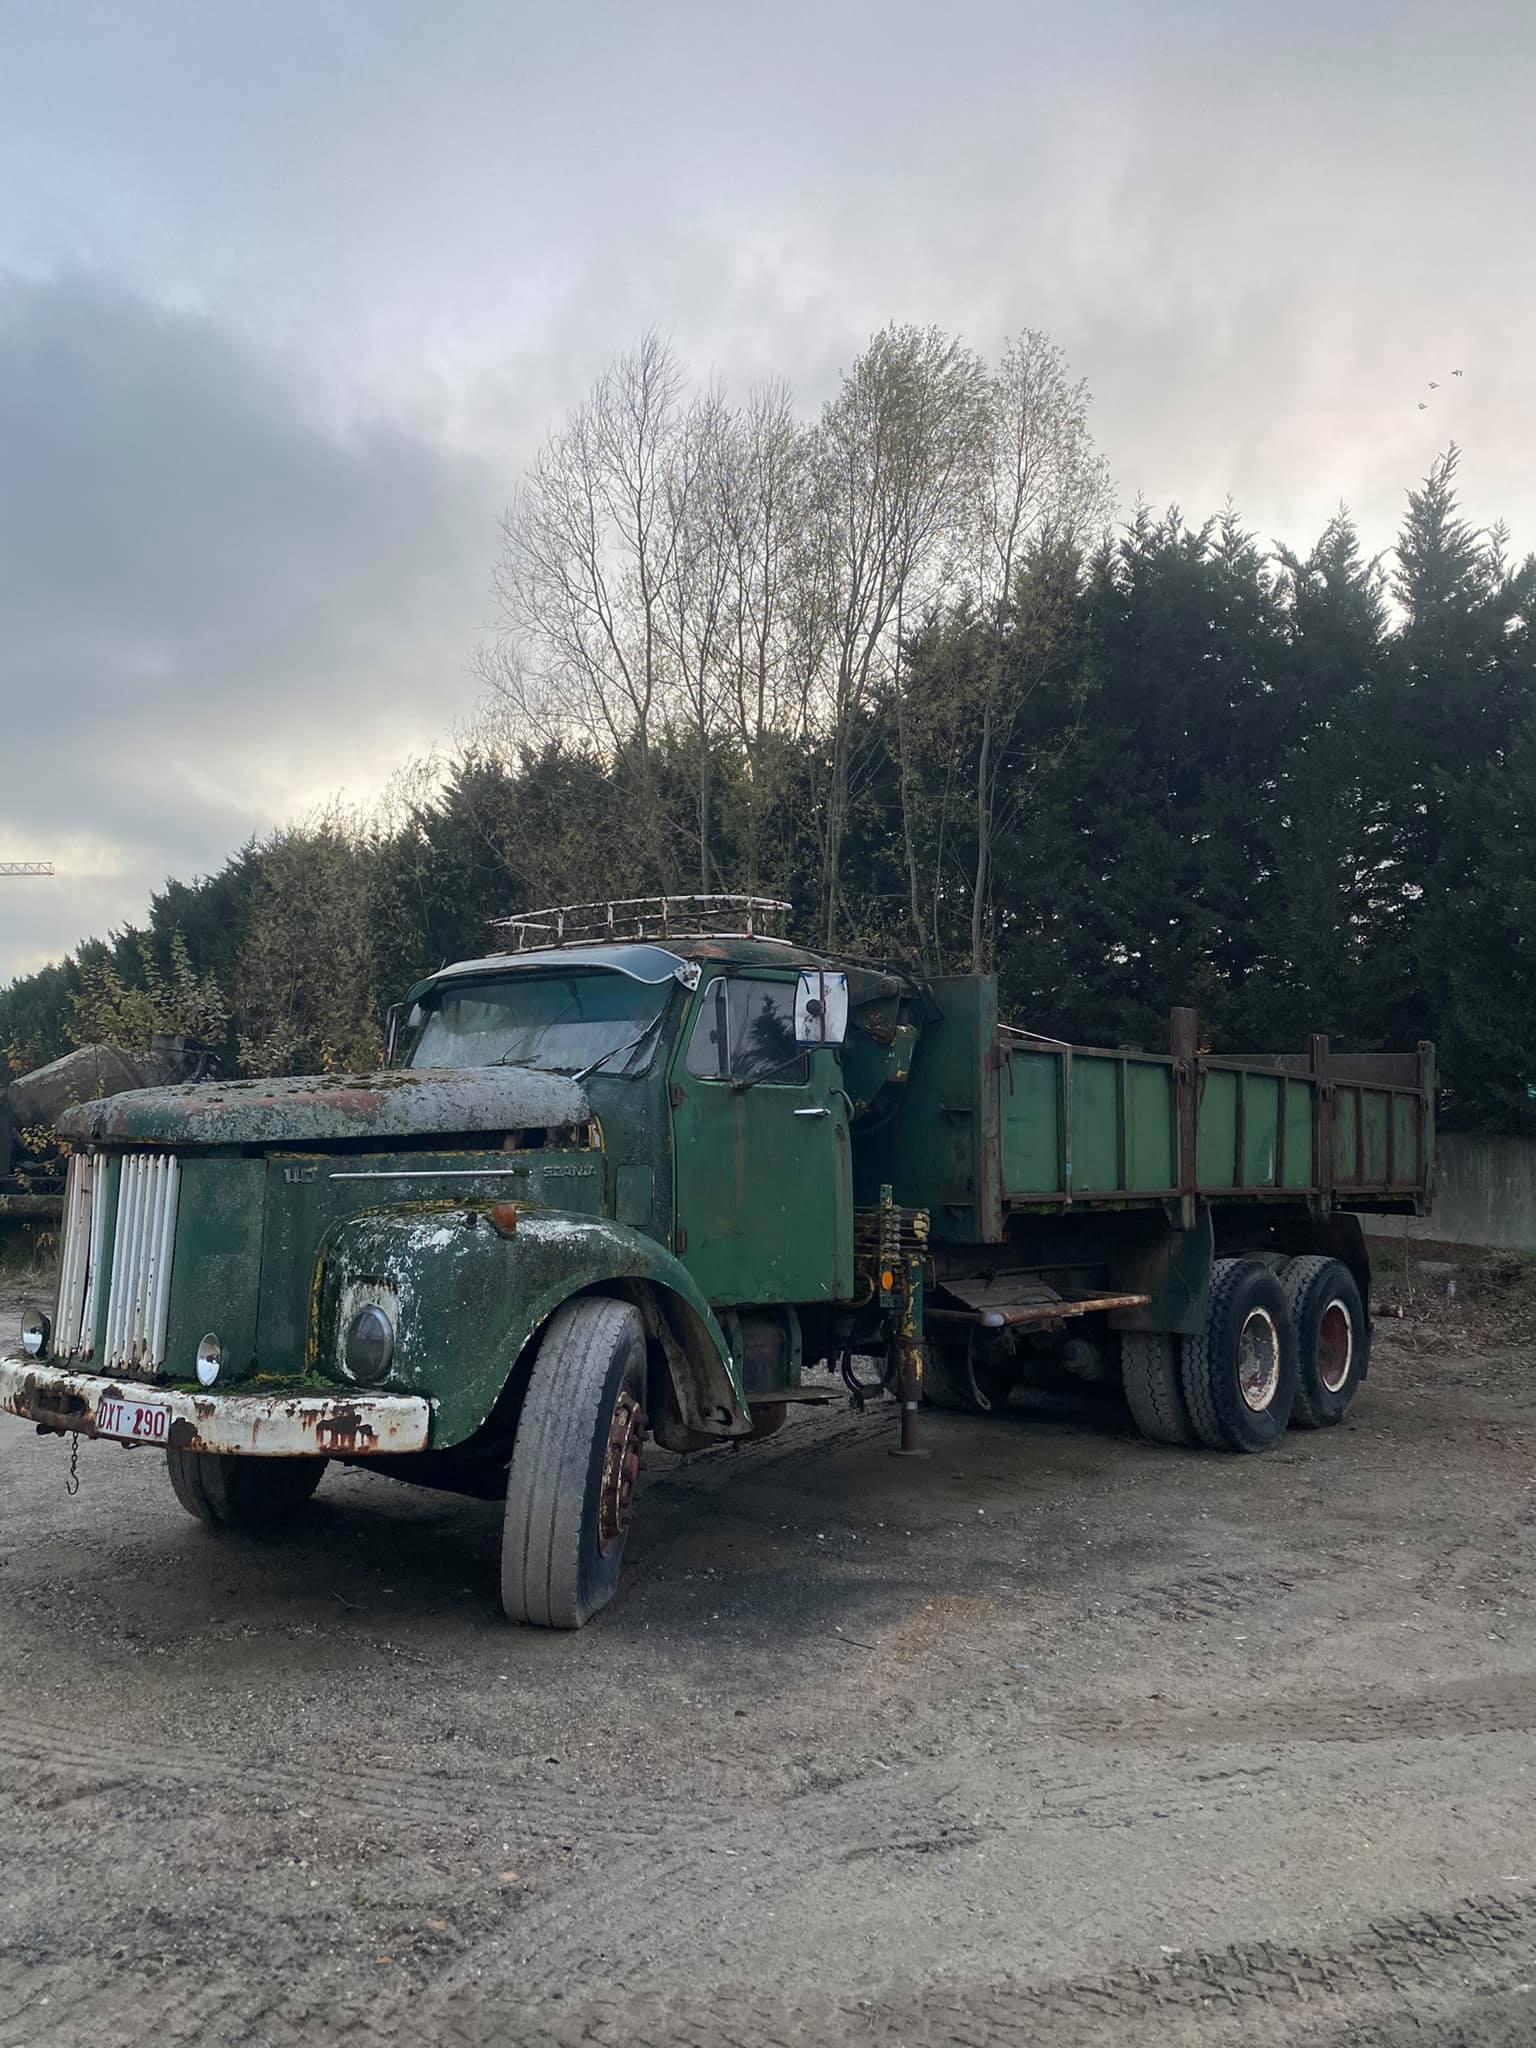 Scania-Vabis-110-Koekoekx-transport-Vilvoorde-(3)